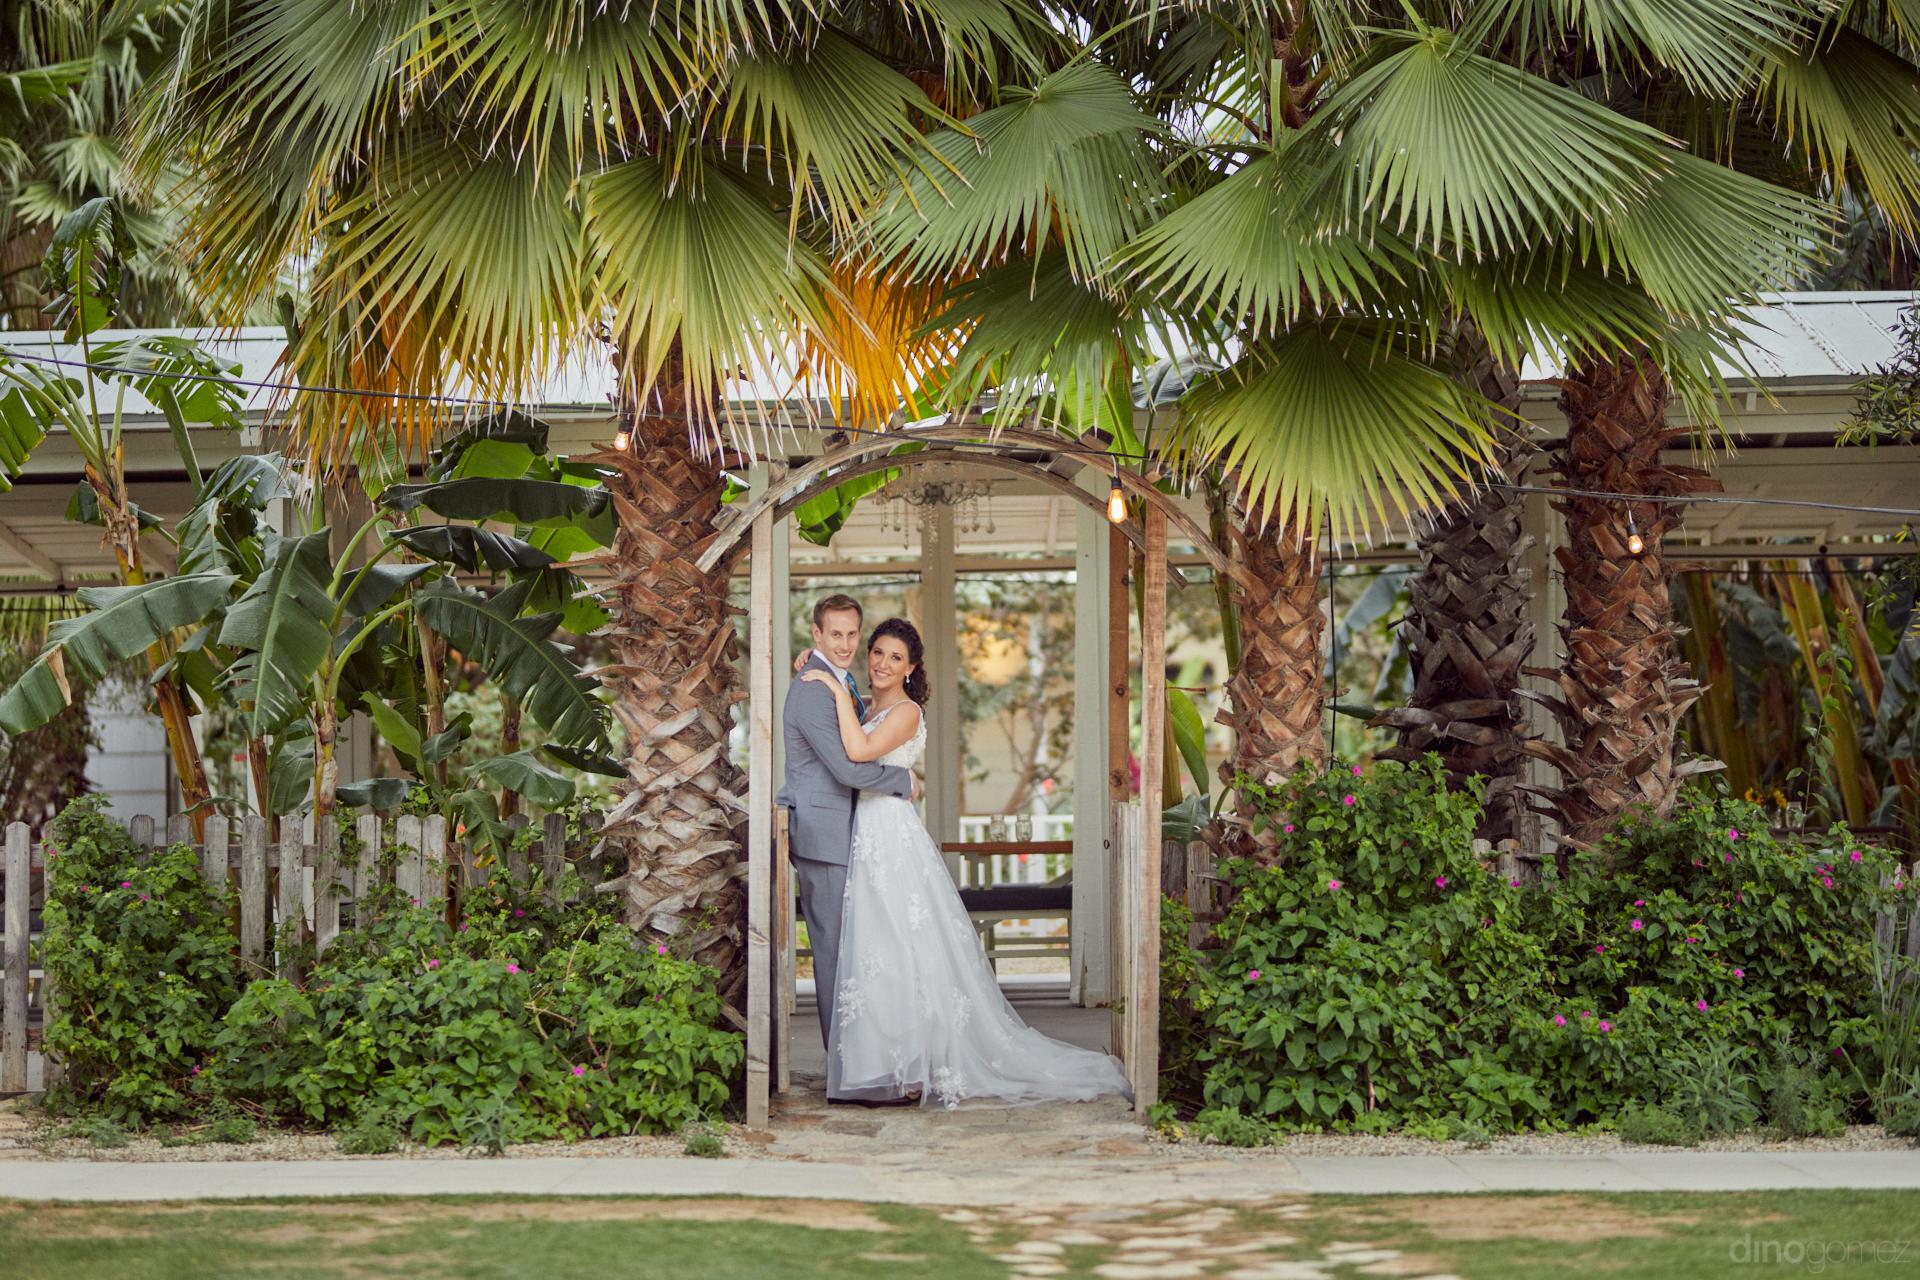 Destination Weddings Los Cabos - Hilary & Bryan Flora Wedding